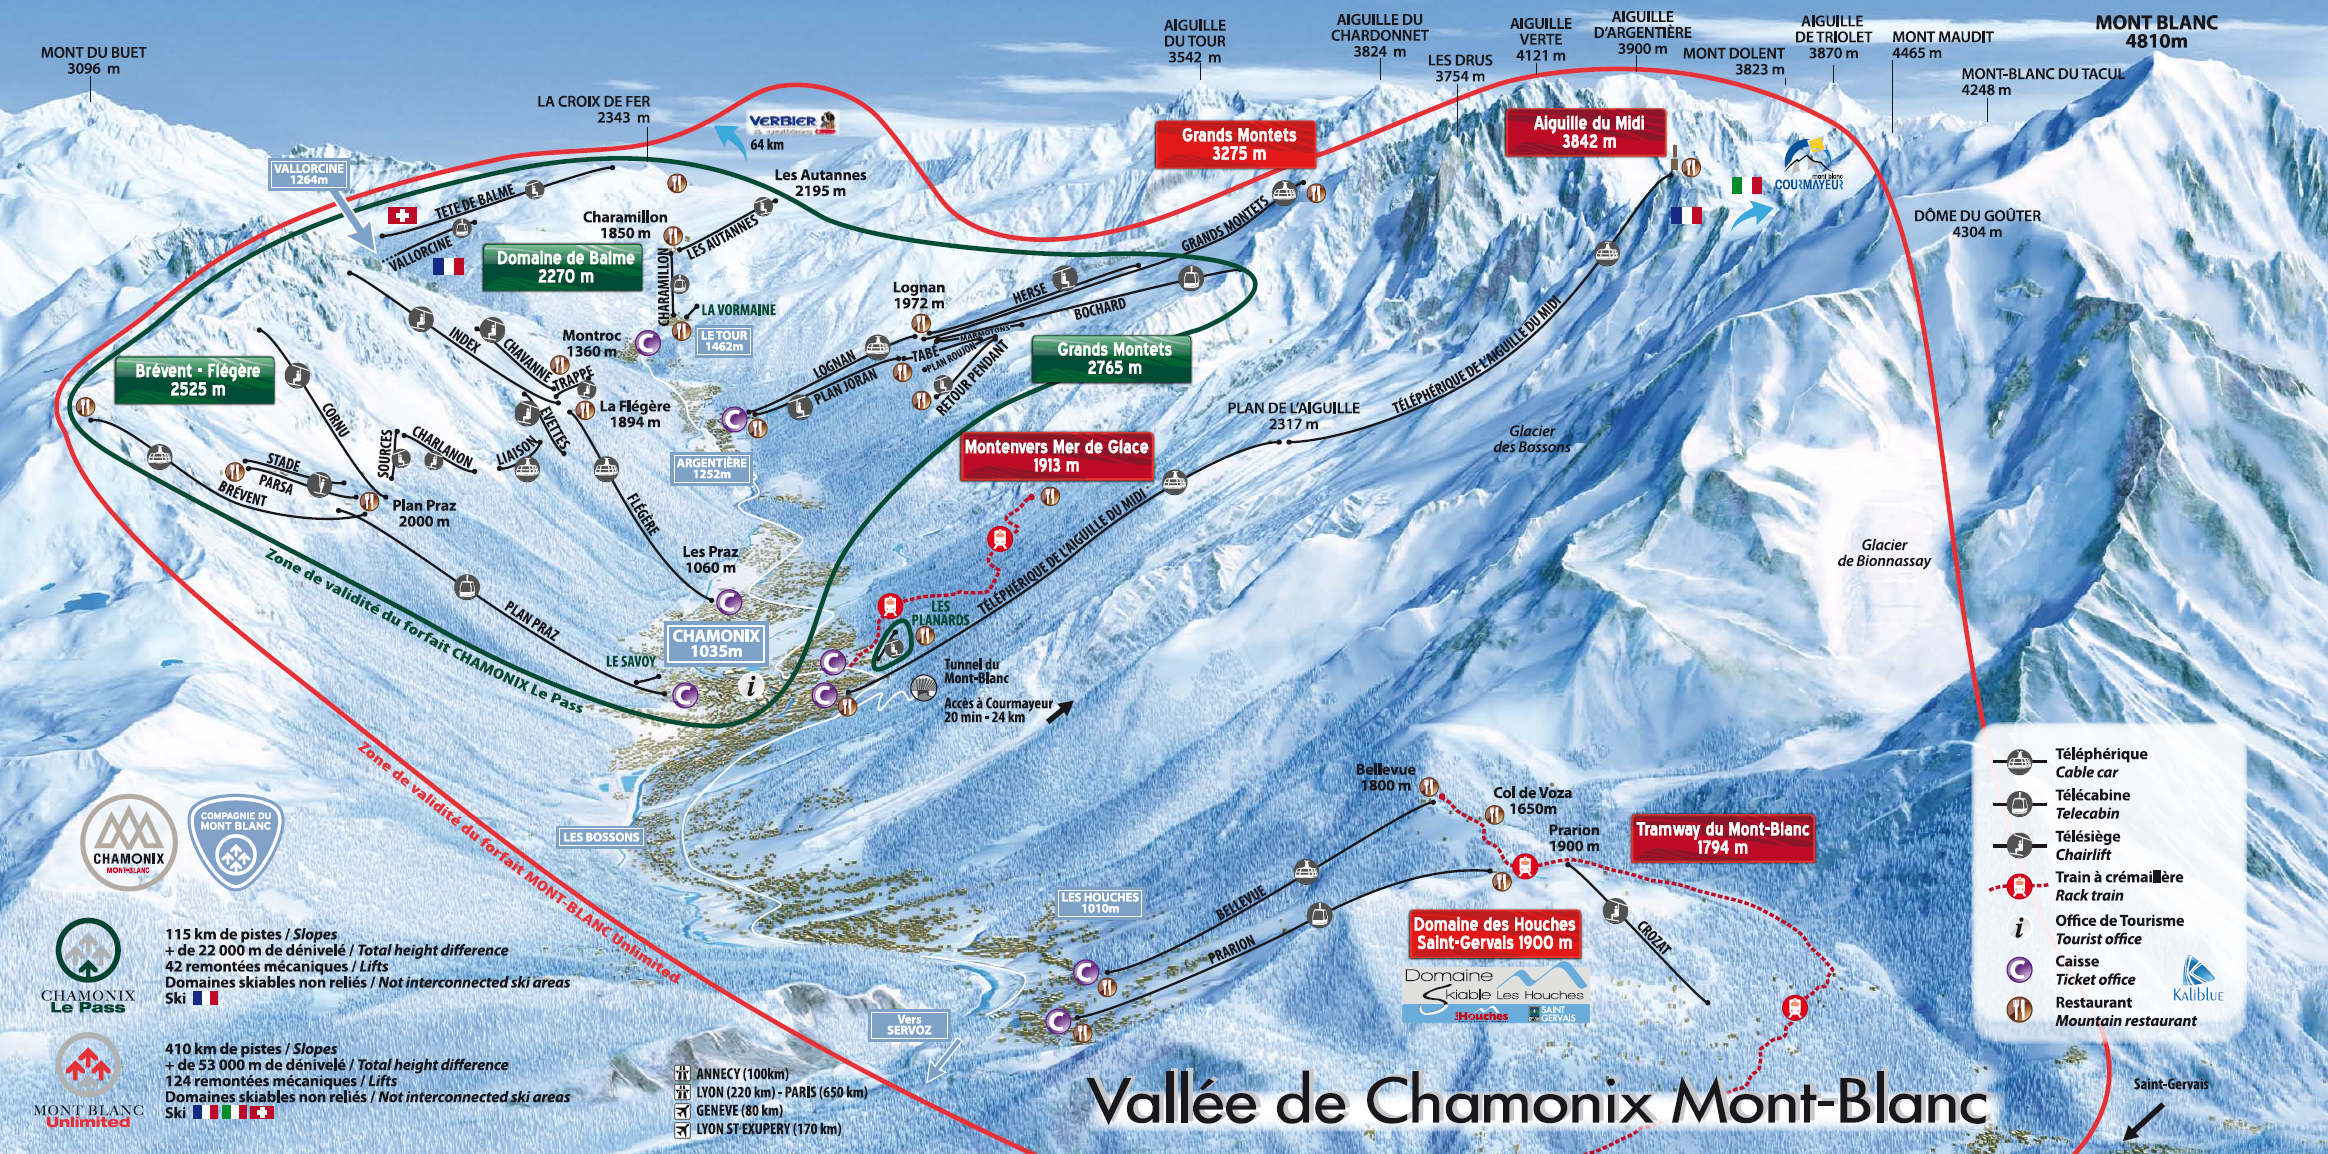 Mont Blanc Ski Hotel And Resort